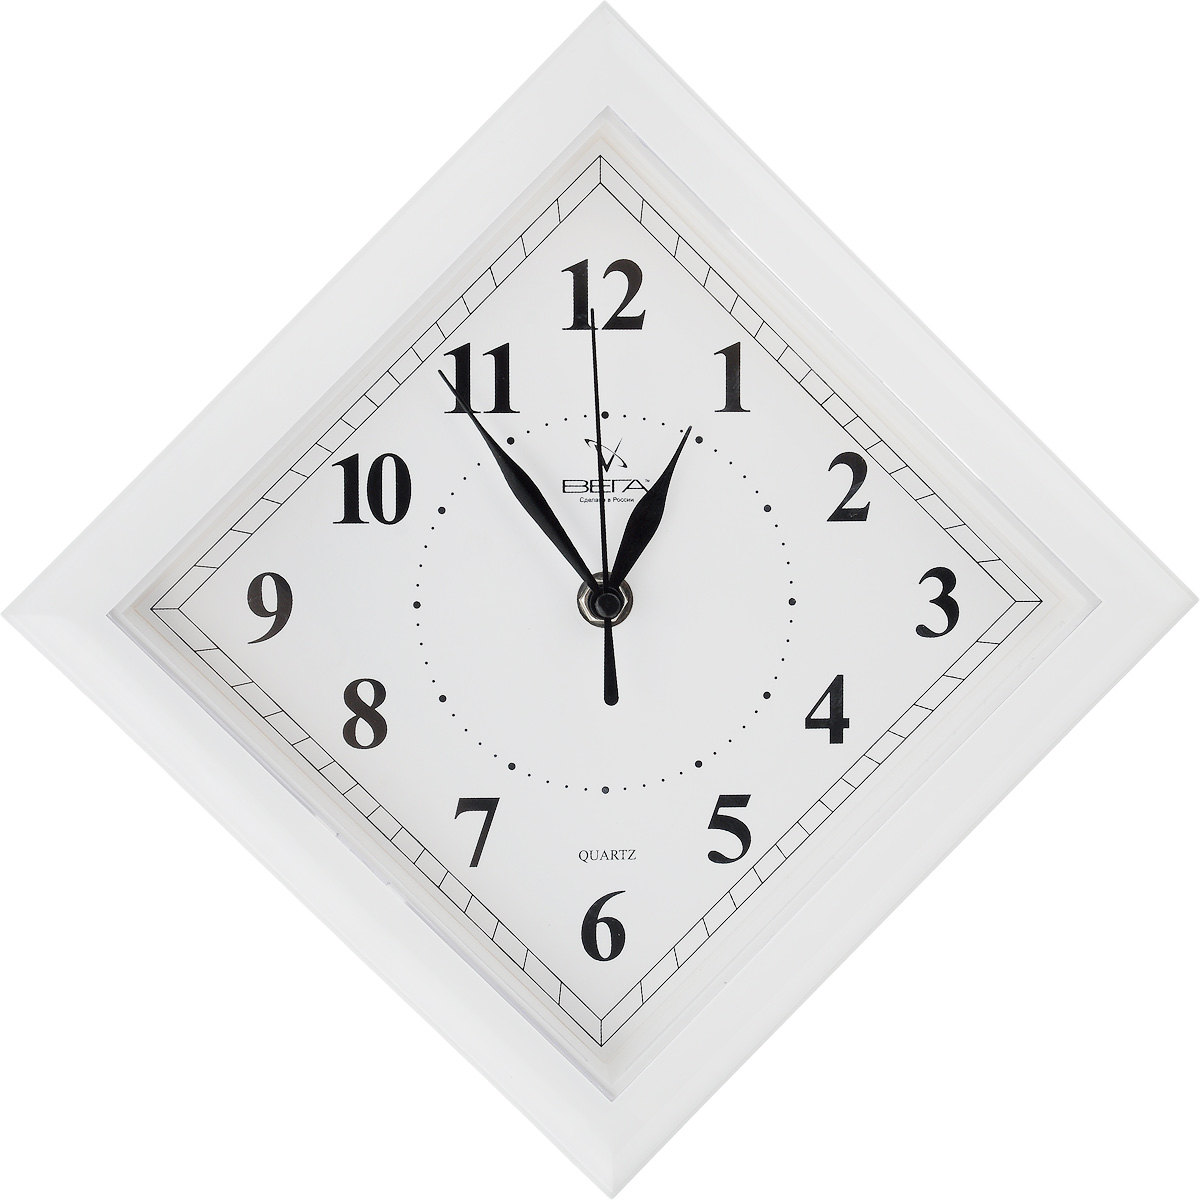 Часы настенные Вега Классика. Ромб, цвет: белый, 20,6 х 20,6 х 4 см часы настенные вега классика цвет белый